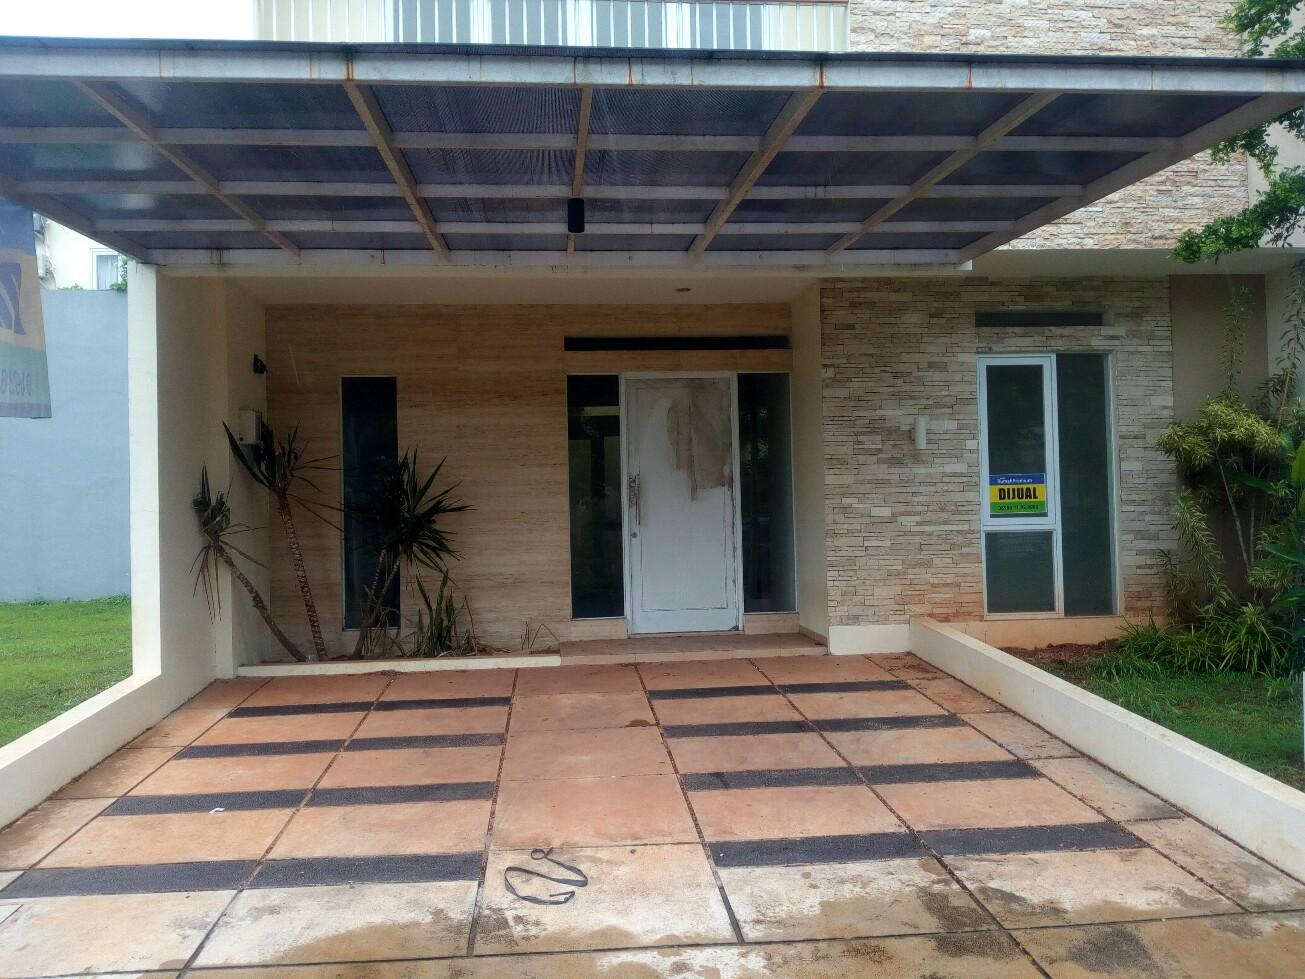 HOUSE FOR SALE : PARADISE RESORT CIPUTAT 4+1BR. Dekat stasiun & (coming soon)MRT Ciputat